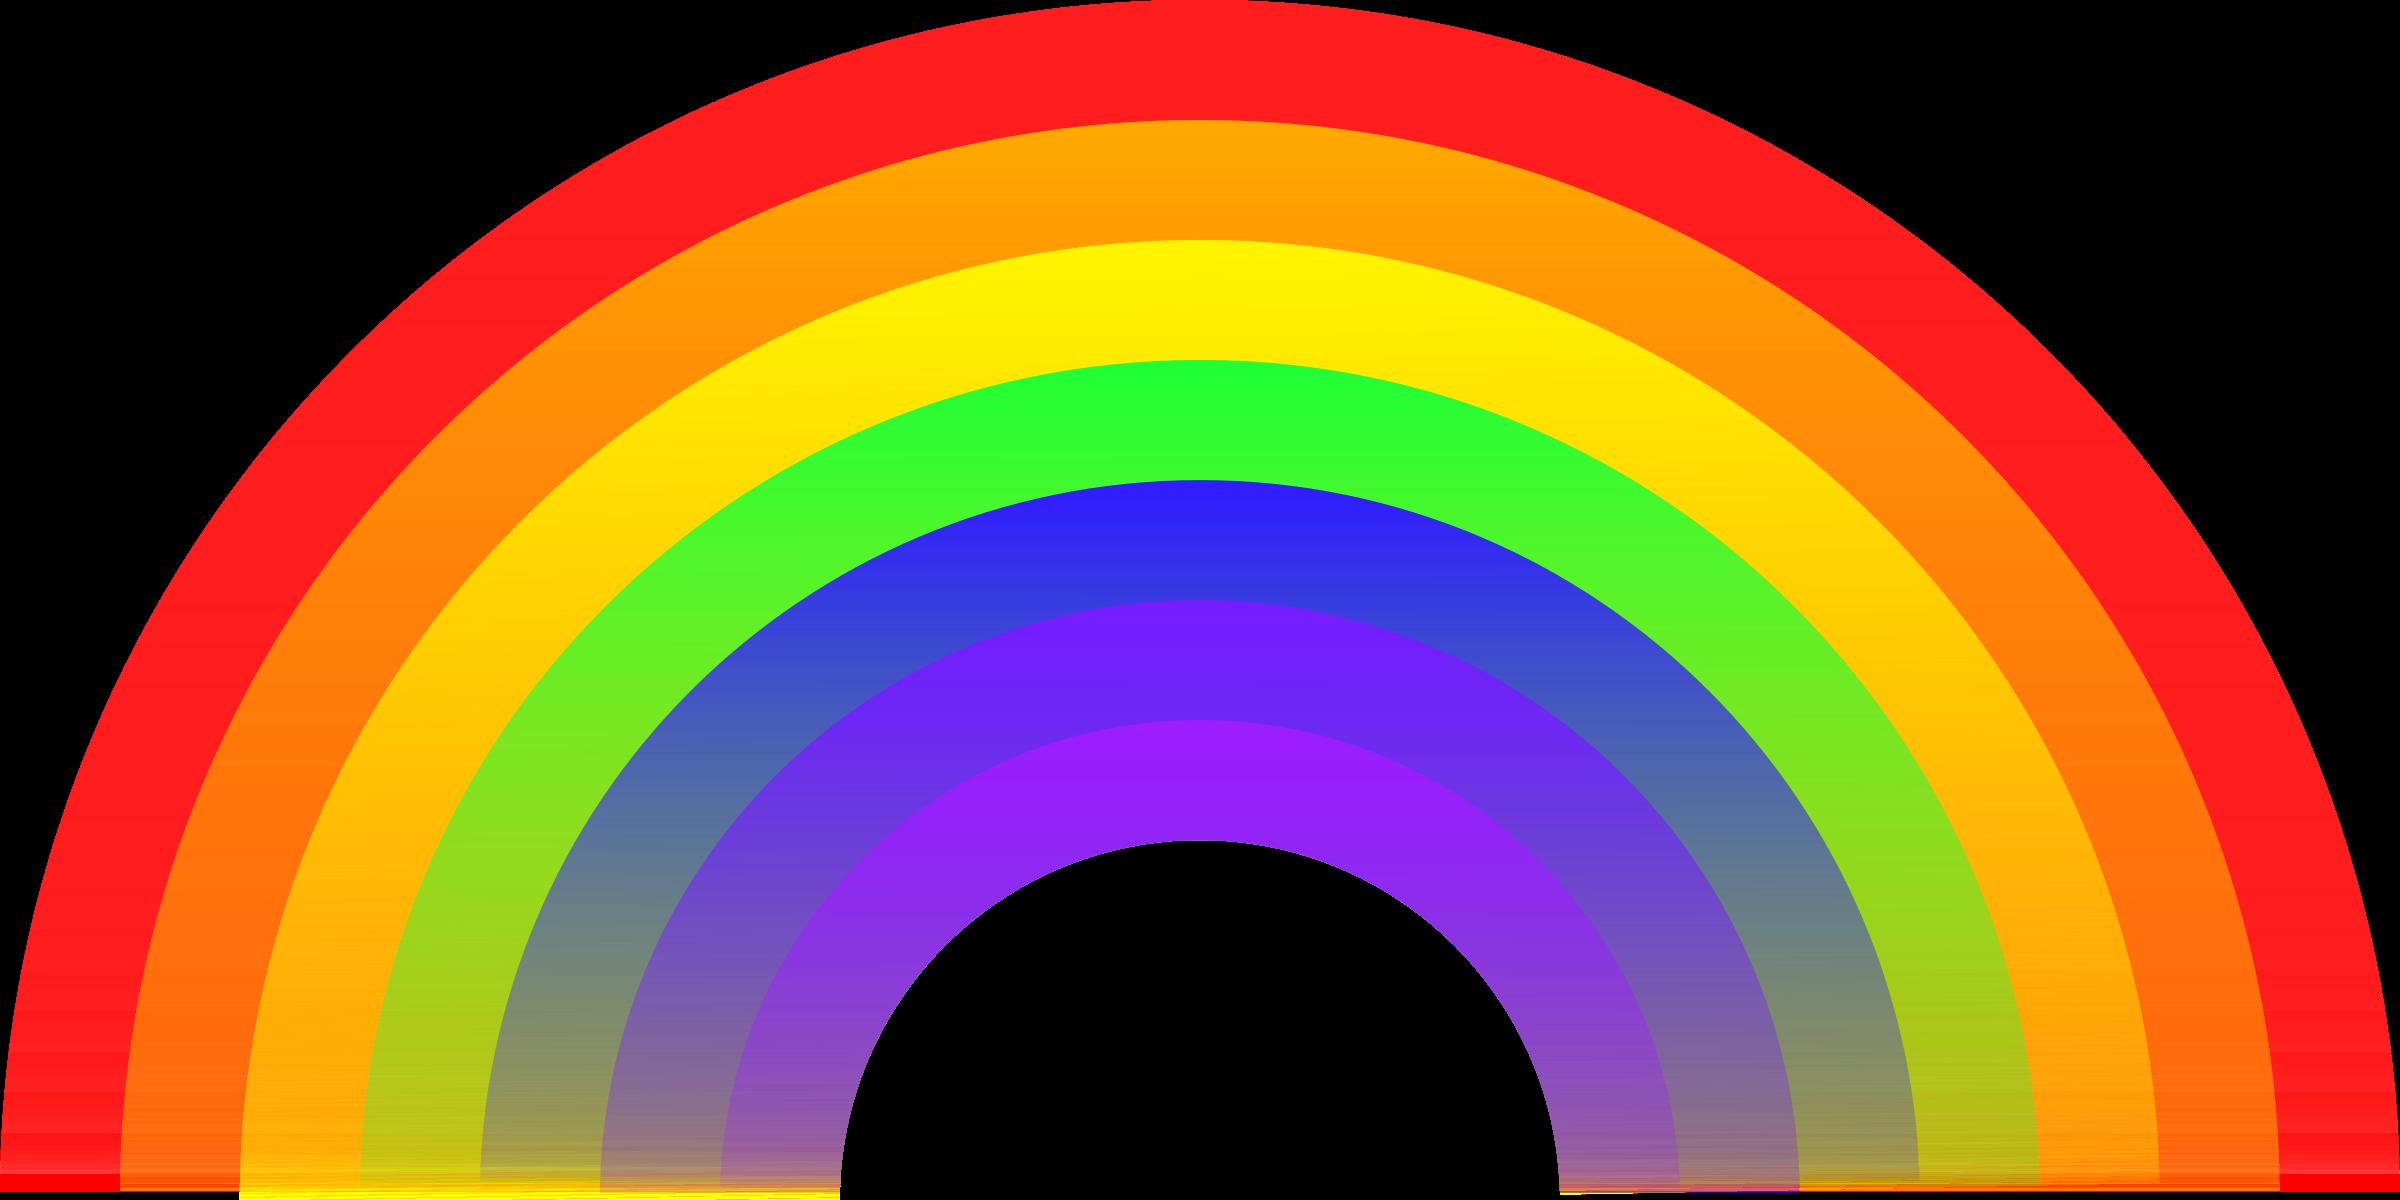 Warna-warna yang ada pada pelangi